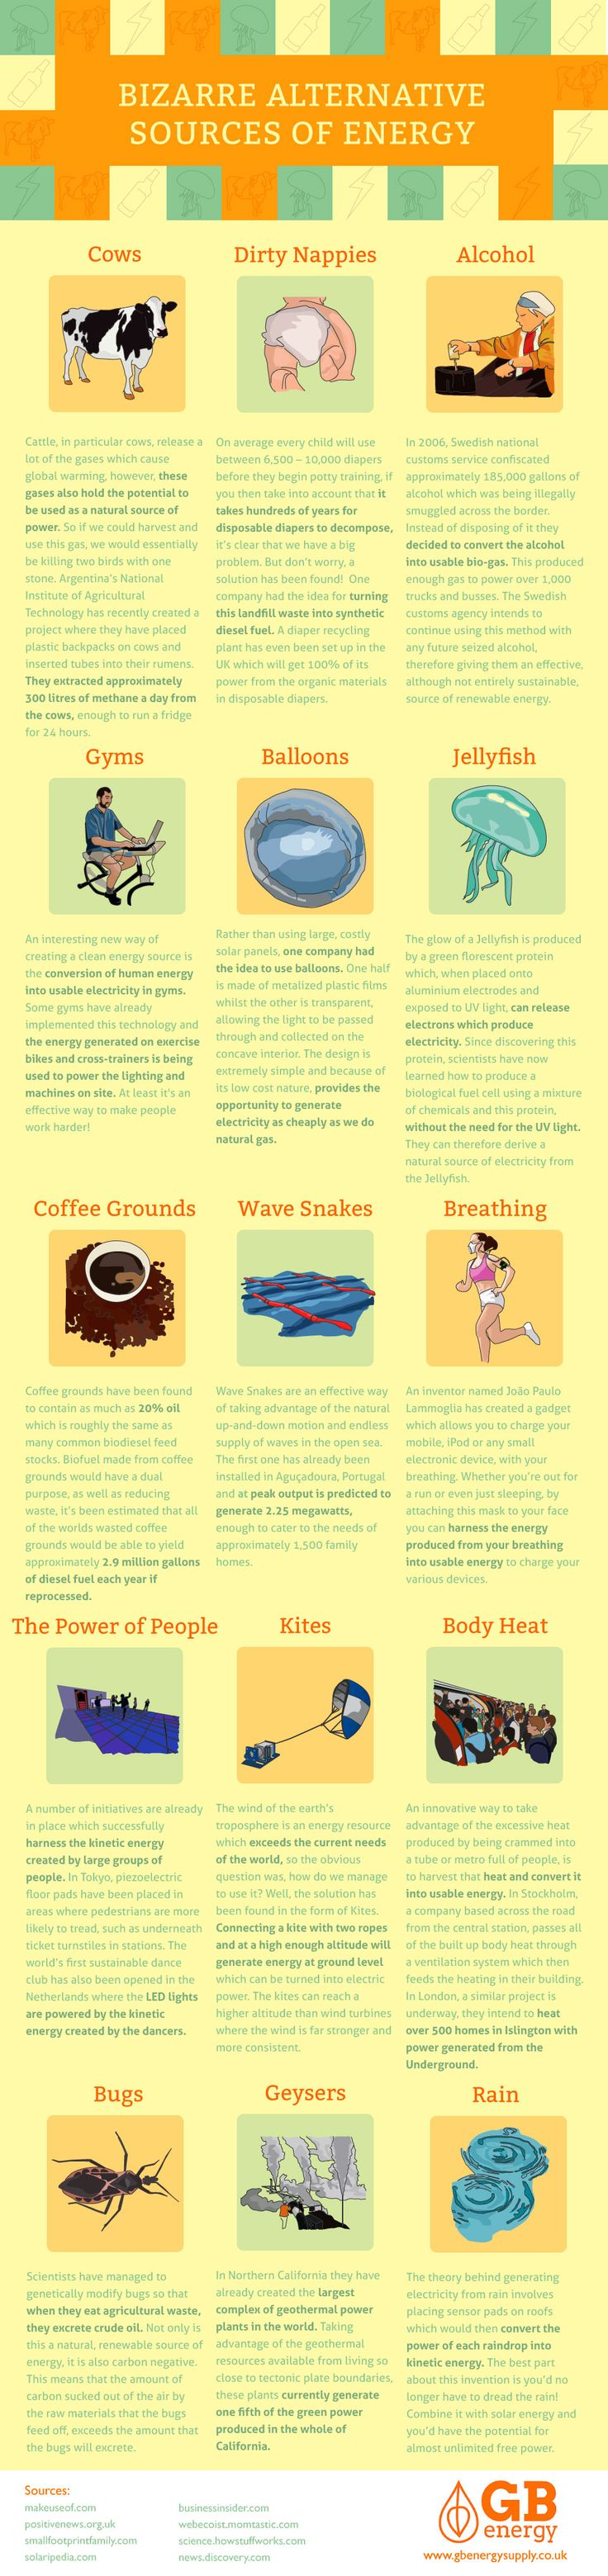 Bizarre Alternative Sources of Energy #infographic #Energy